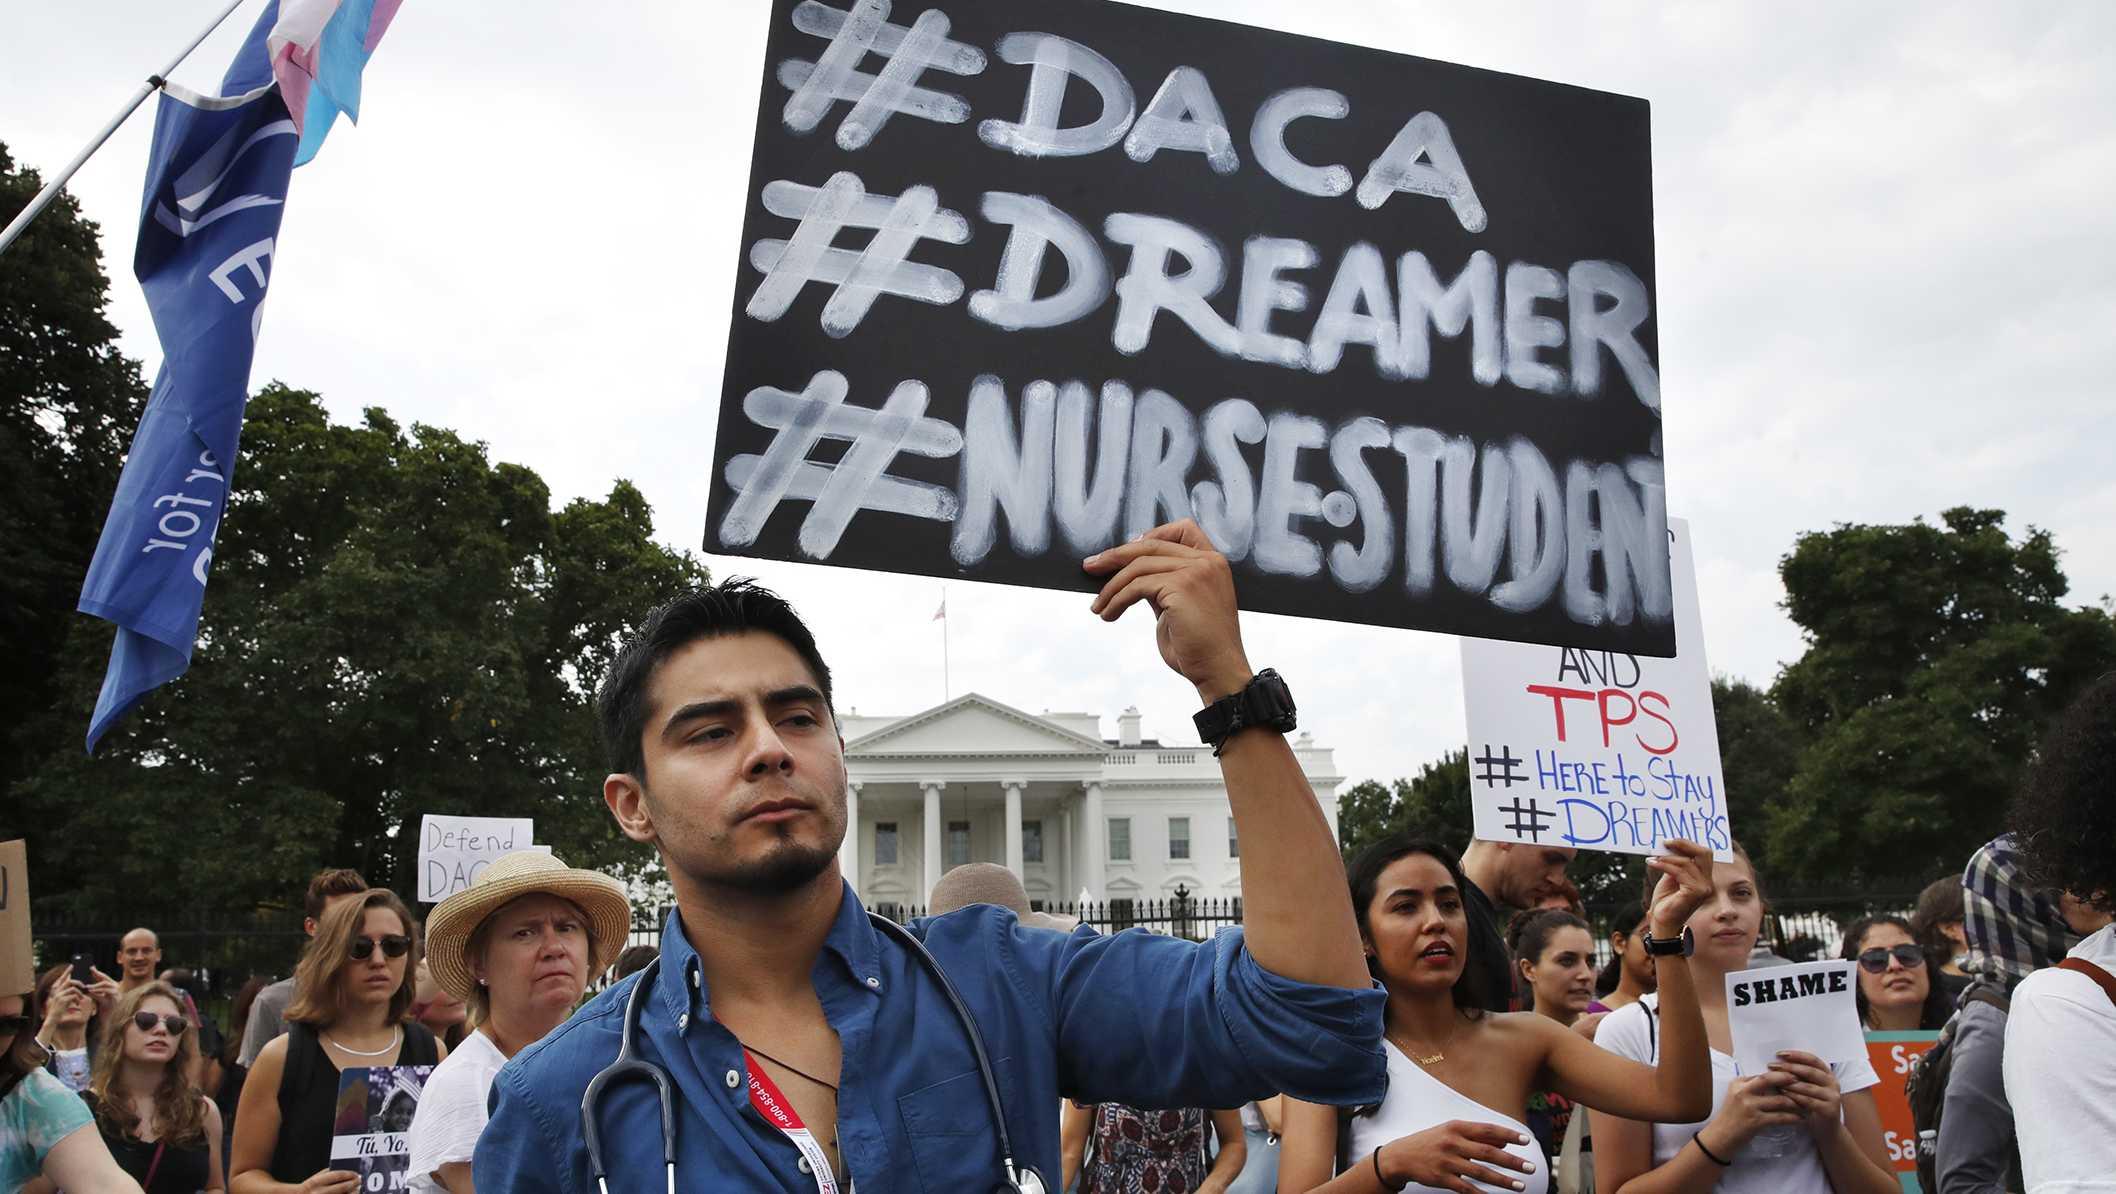 DACA Dreamer